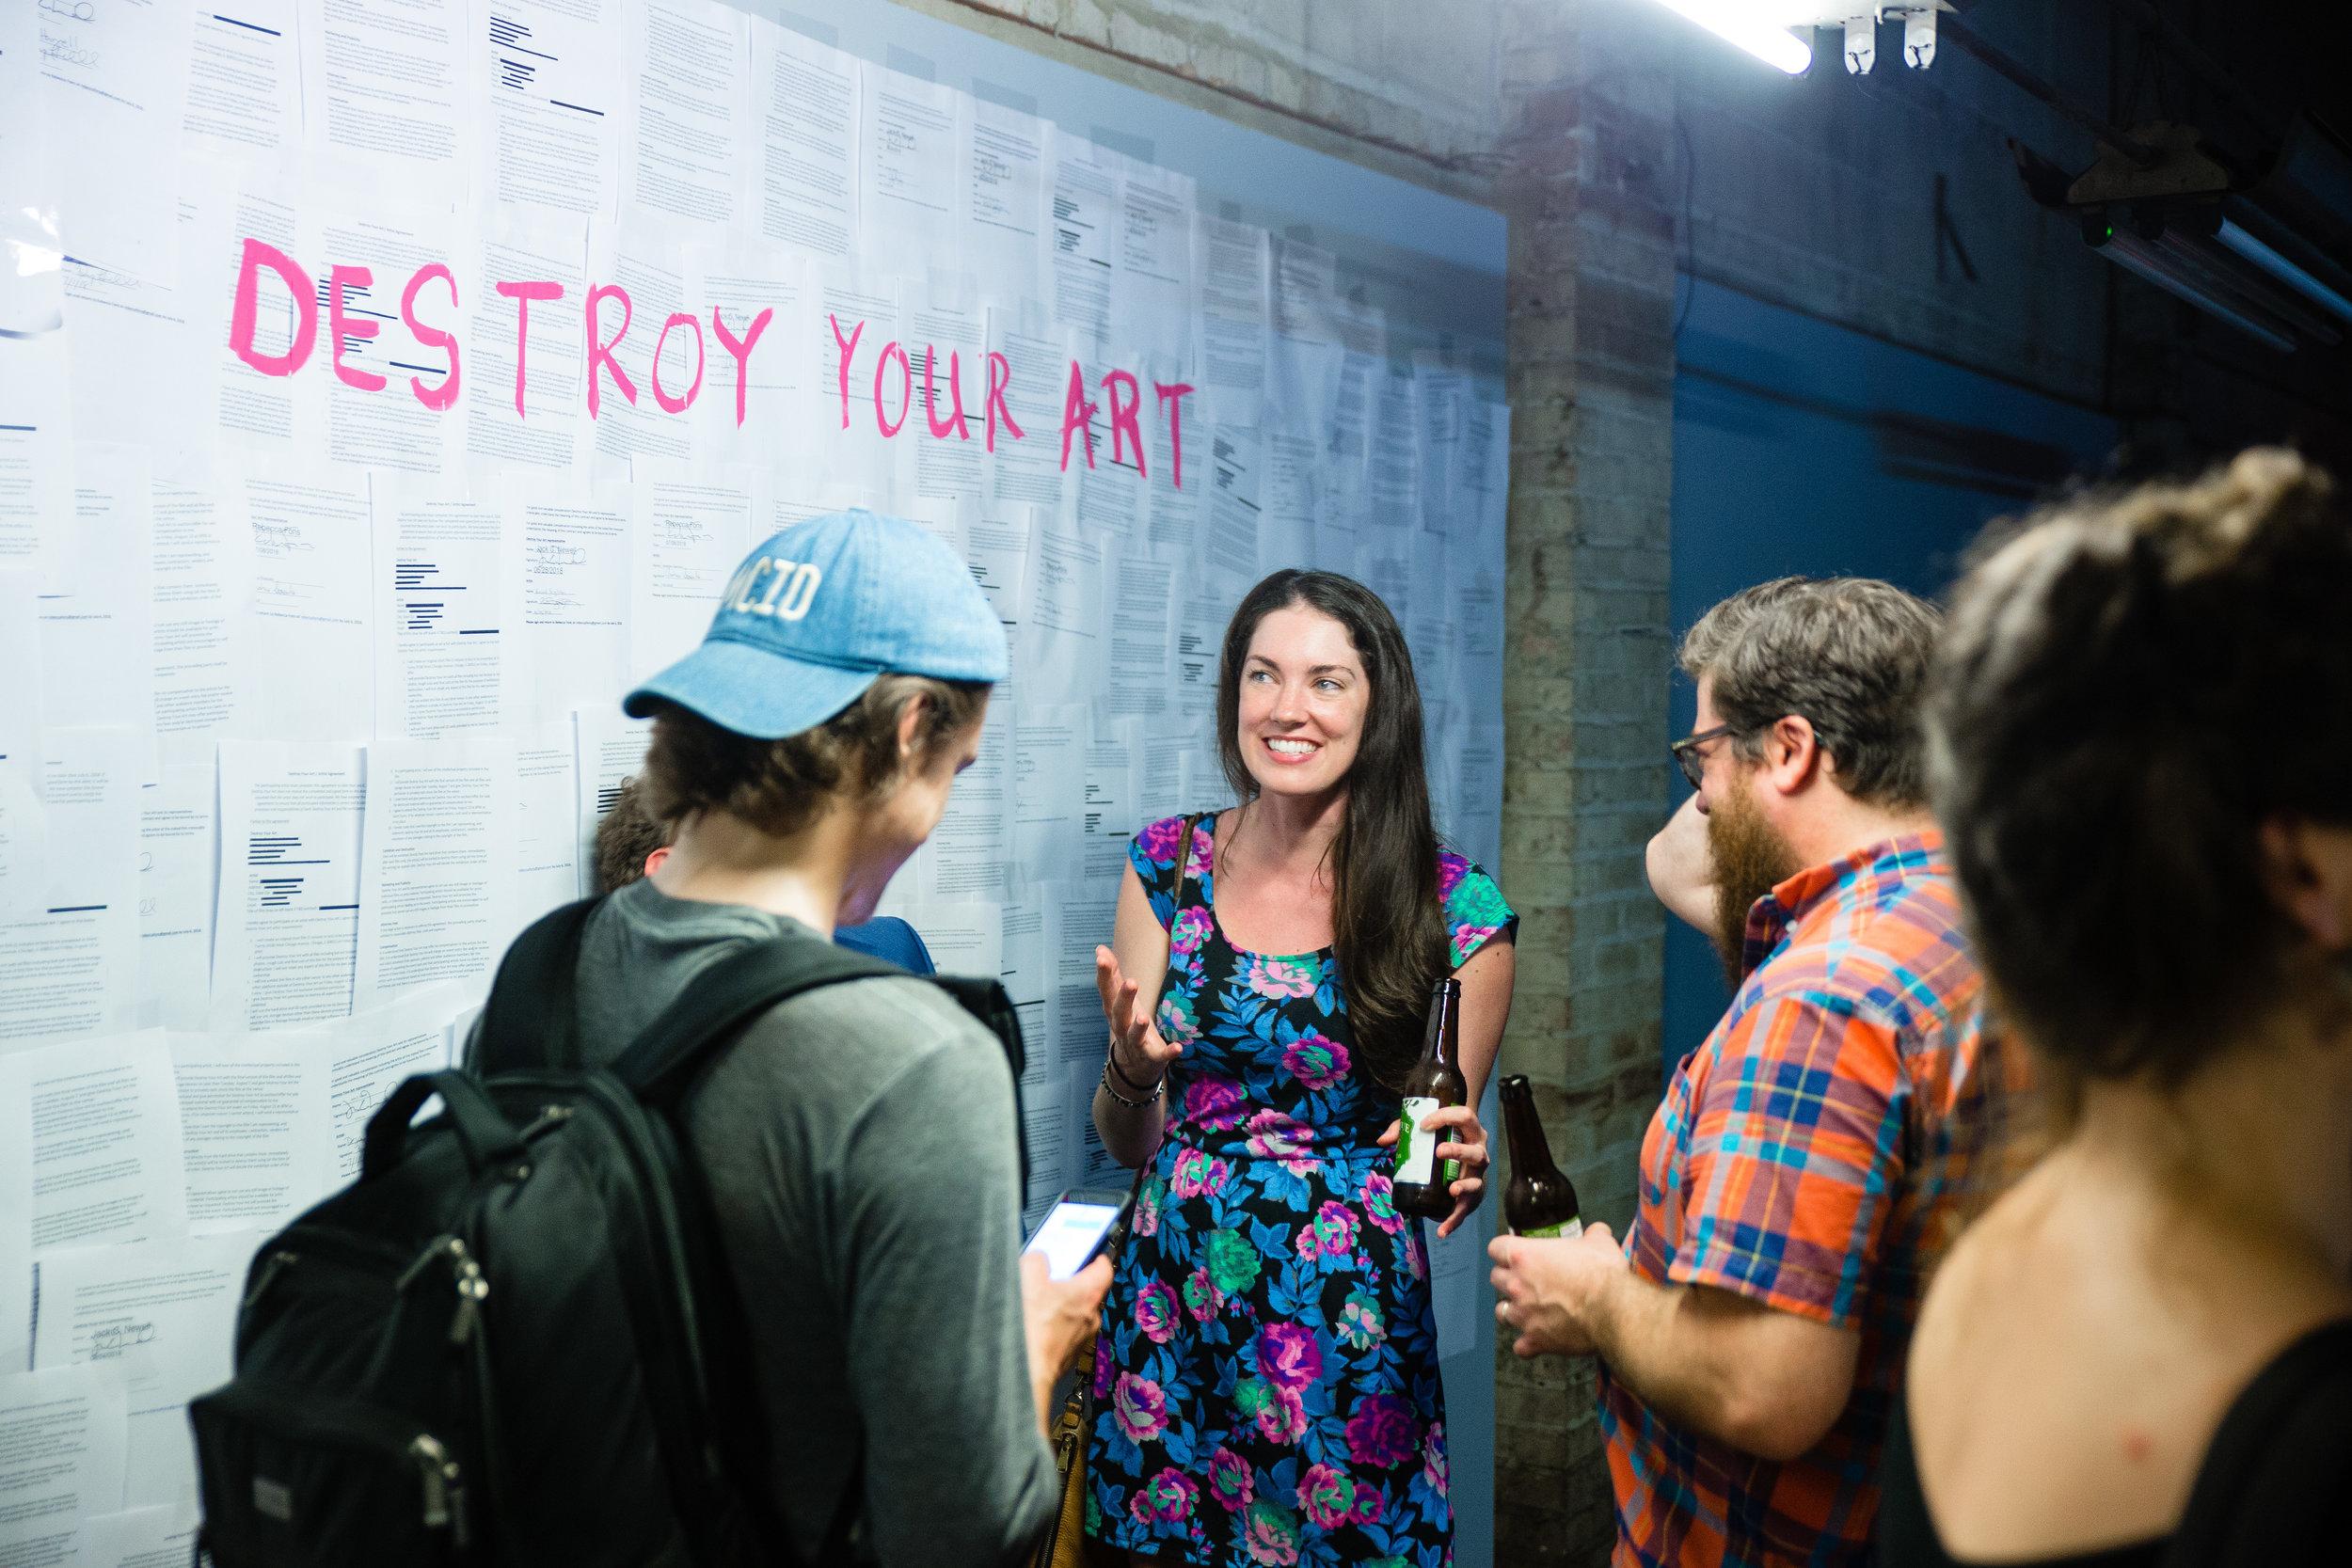 Destroy Your Art 08-10-18 timothymschmidt-1621.jpg